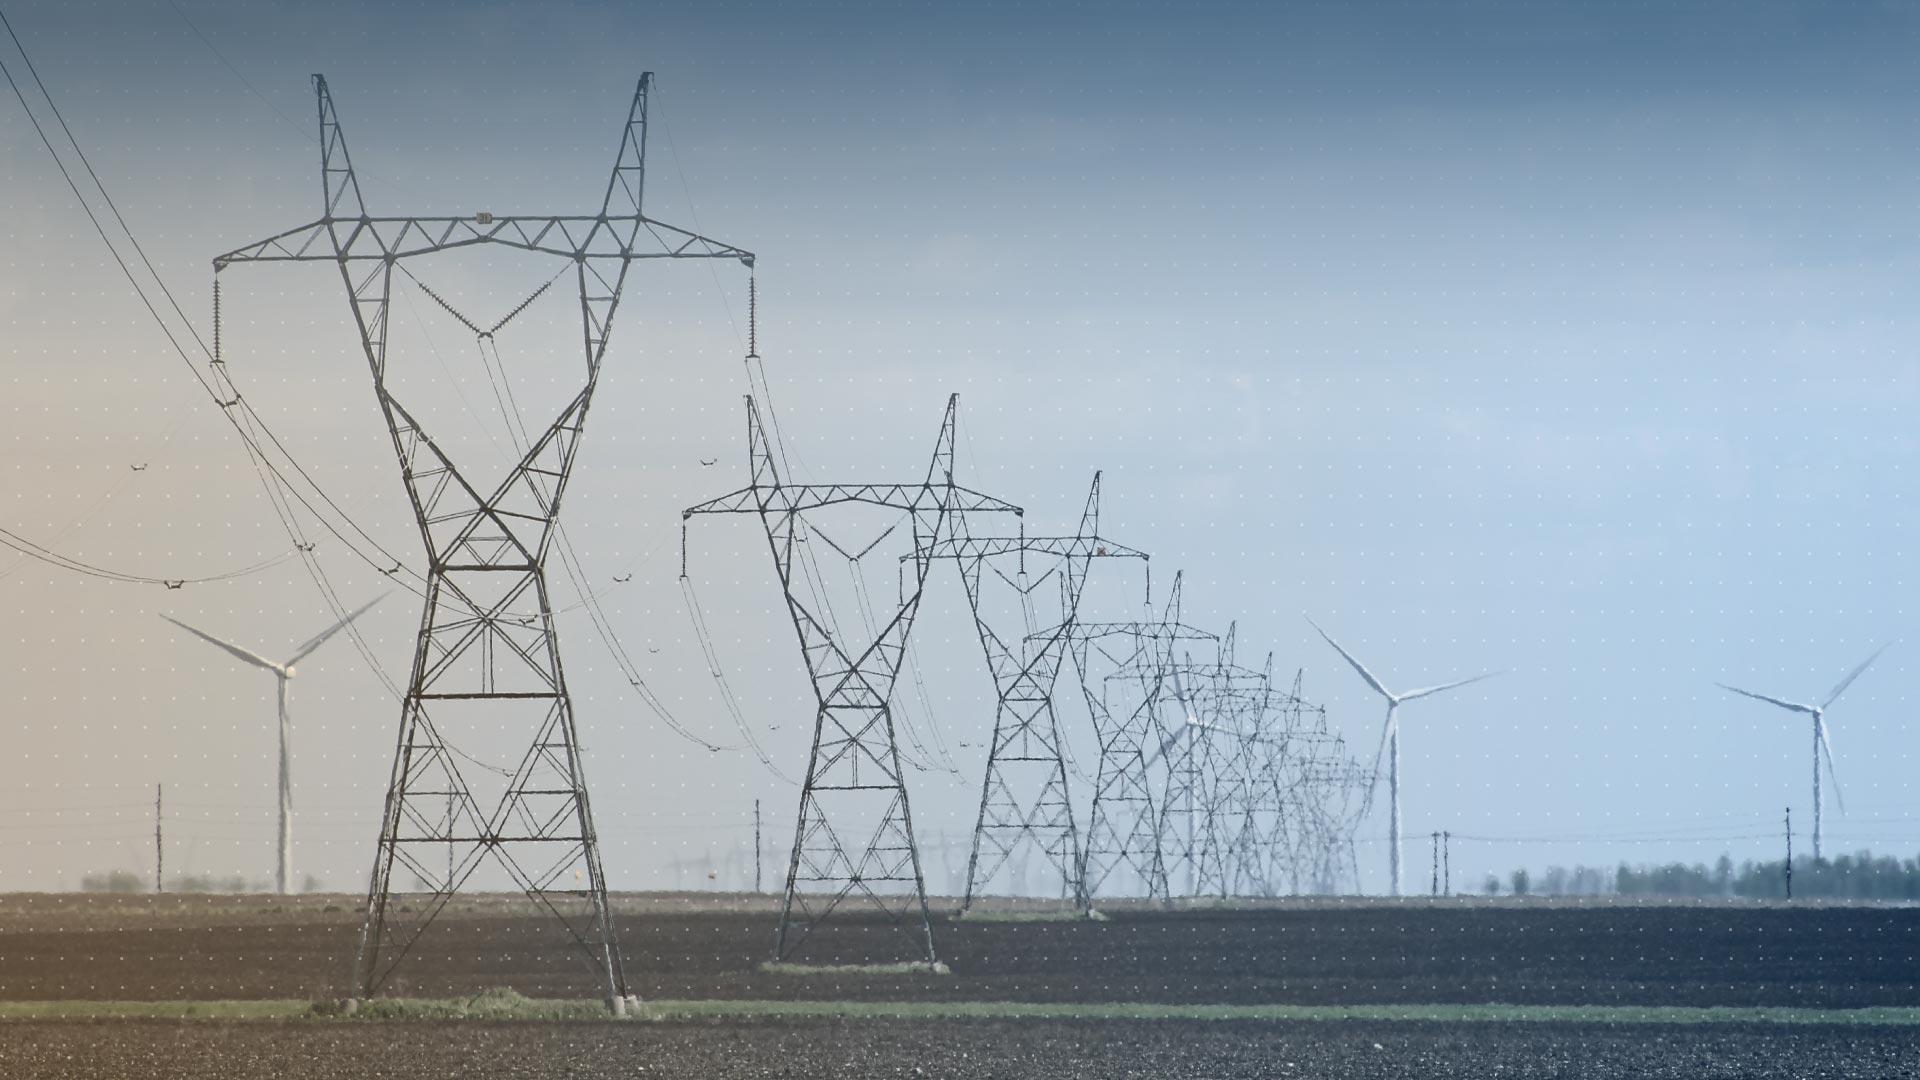 torre transmissão energia